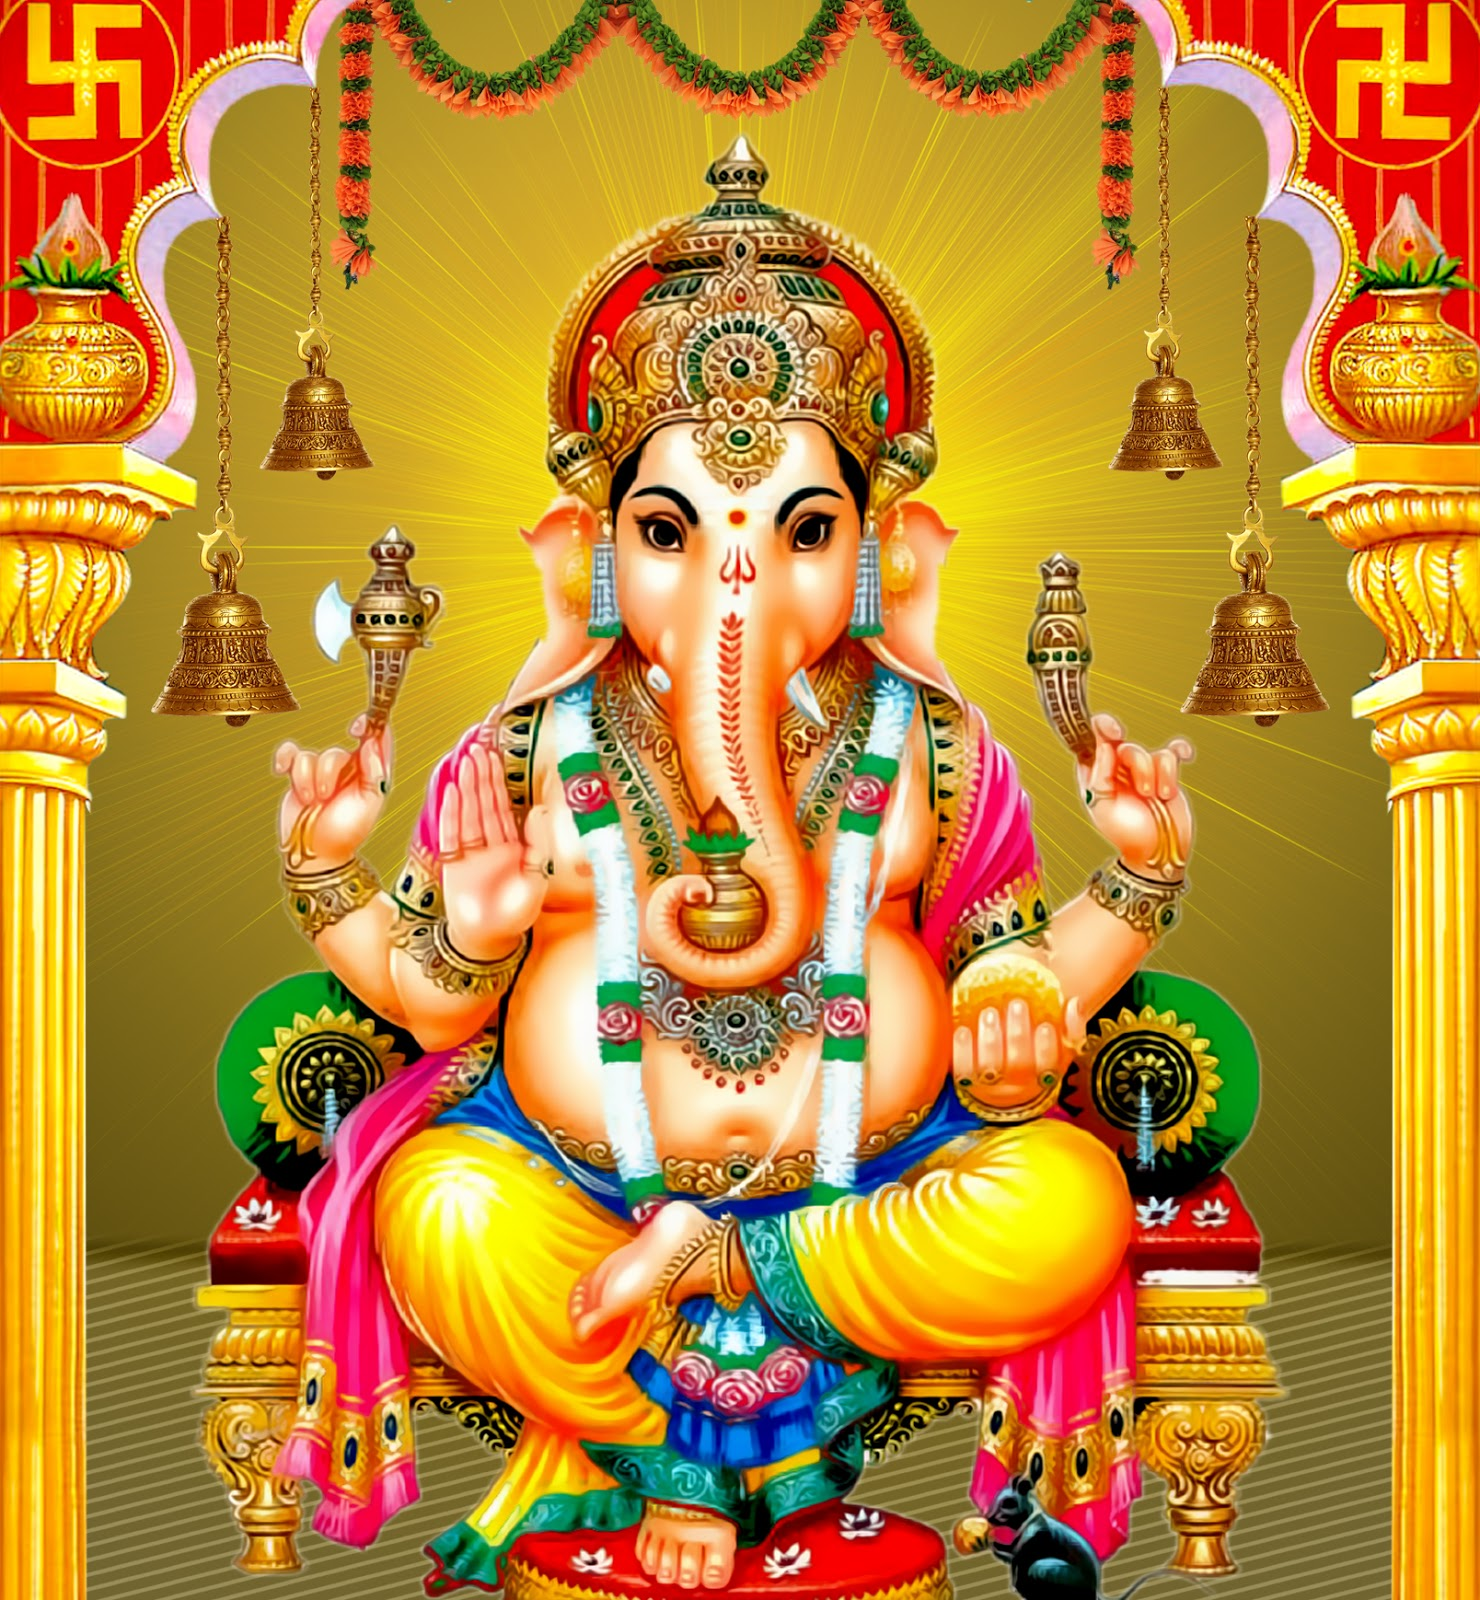 Kulfyappcom Presents Lord Ganesh Video Gif